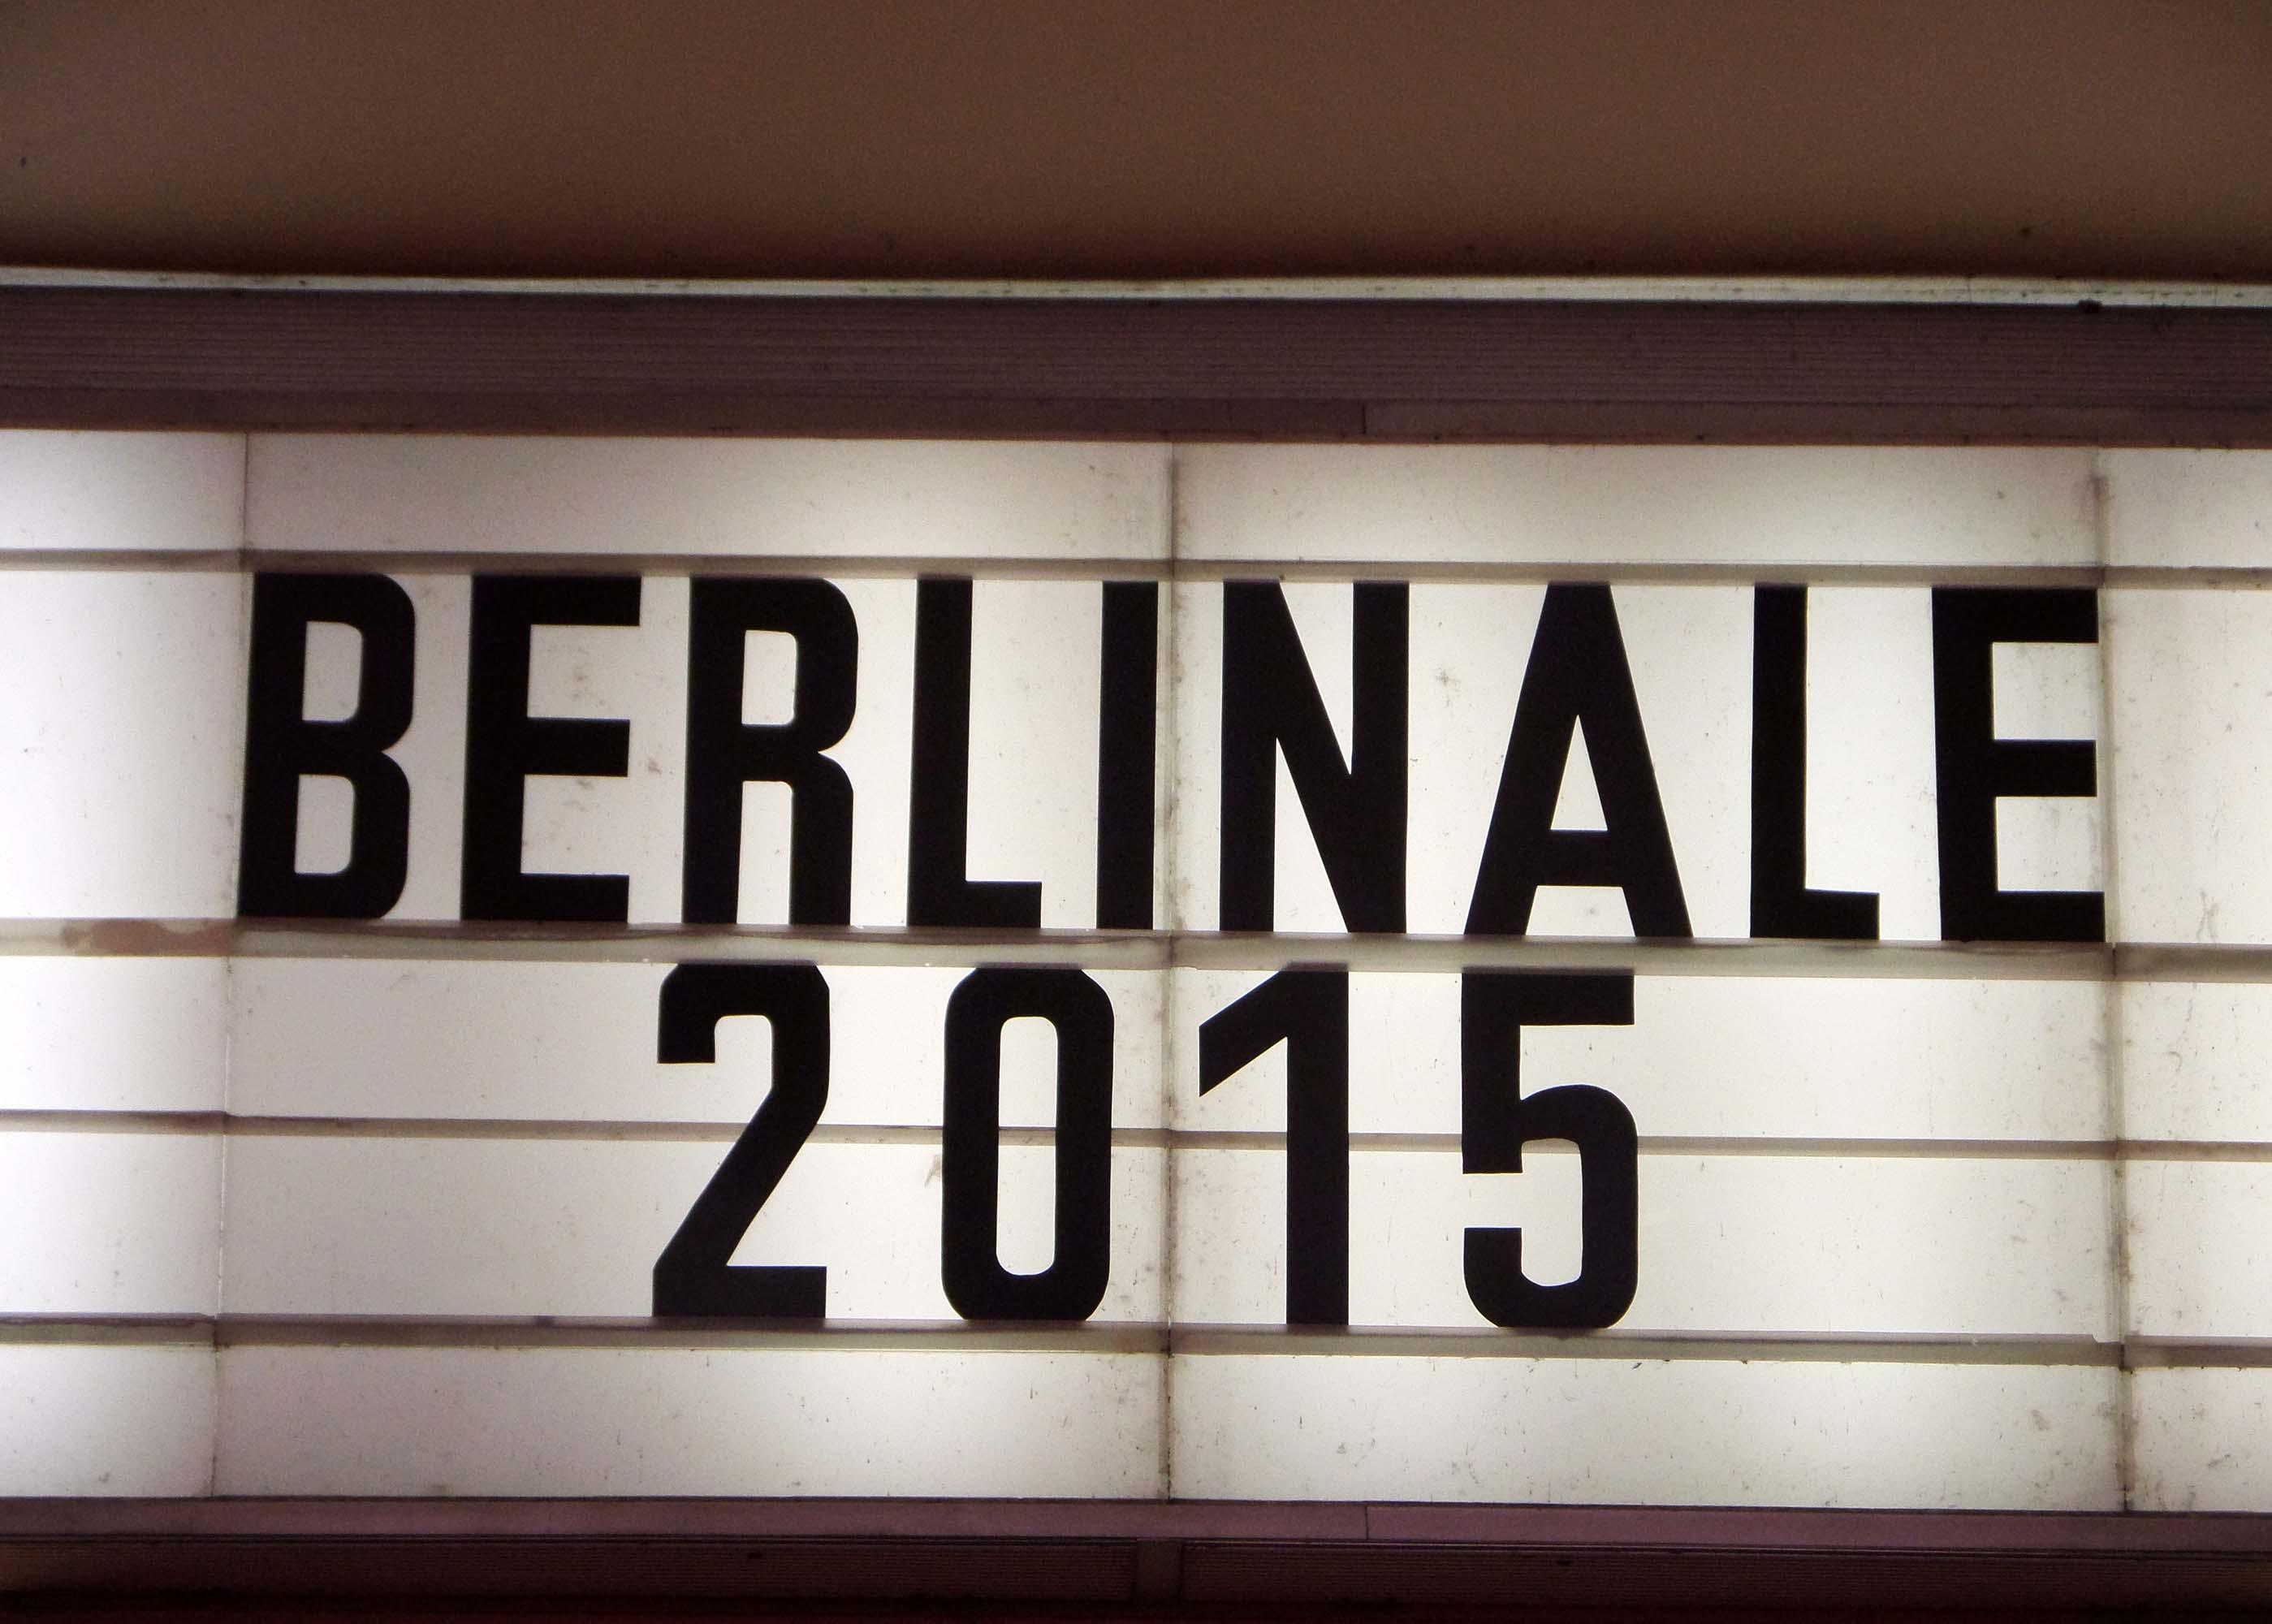 Berlinale 2015 copyright: metterschling 2015